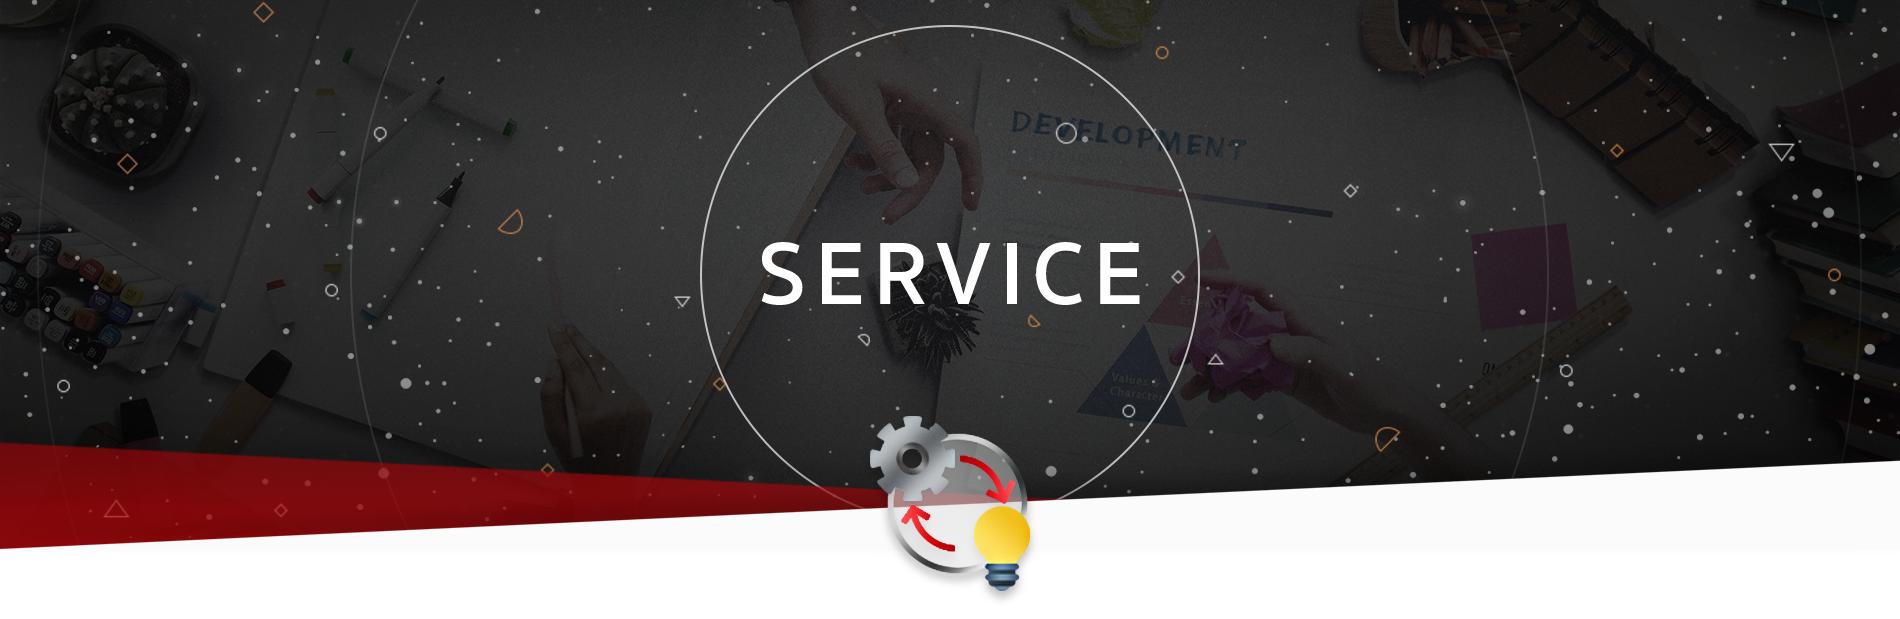 service-banner